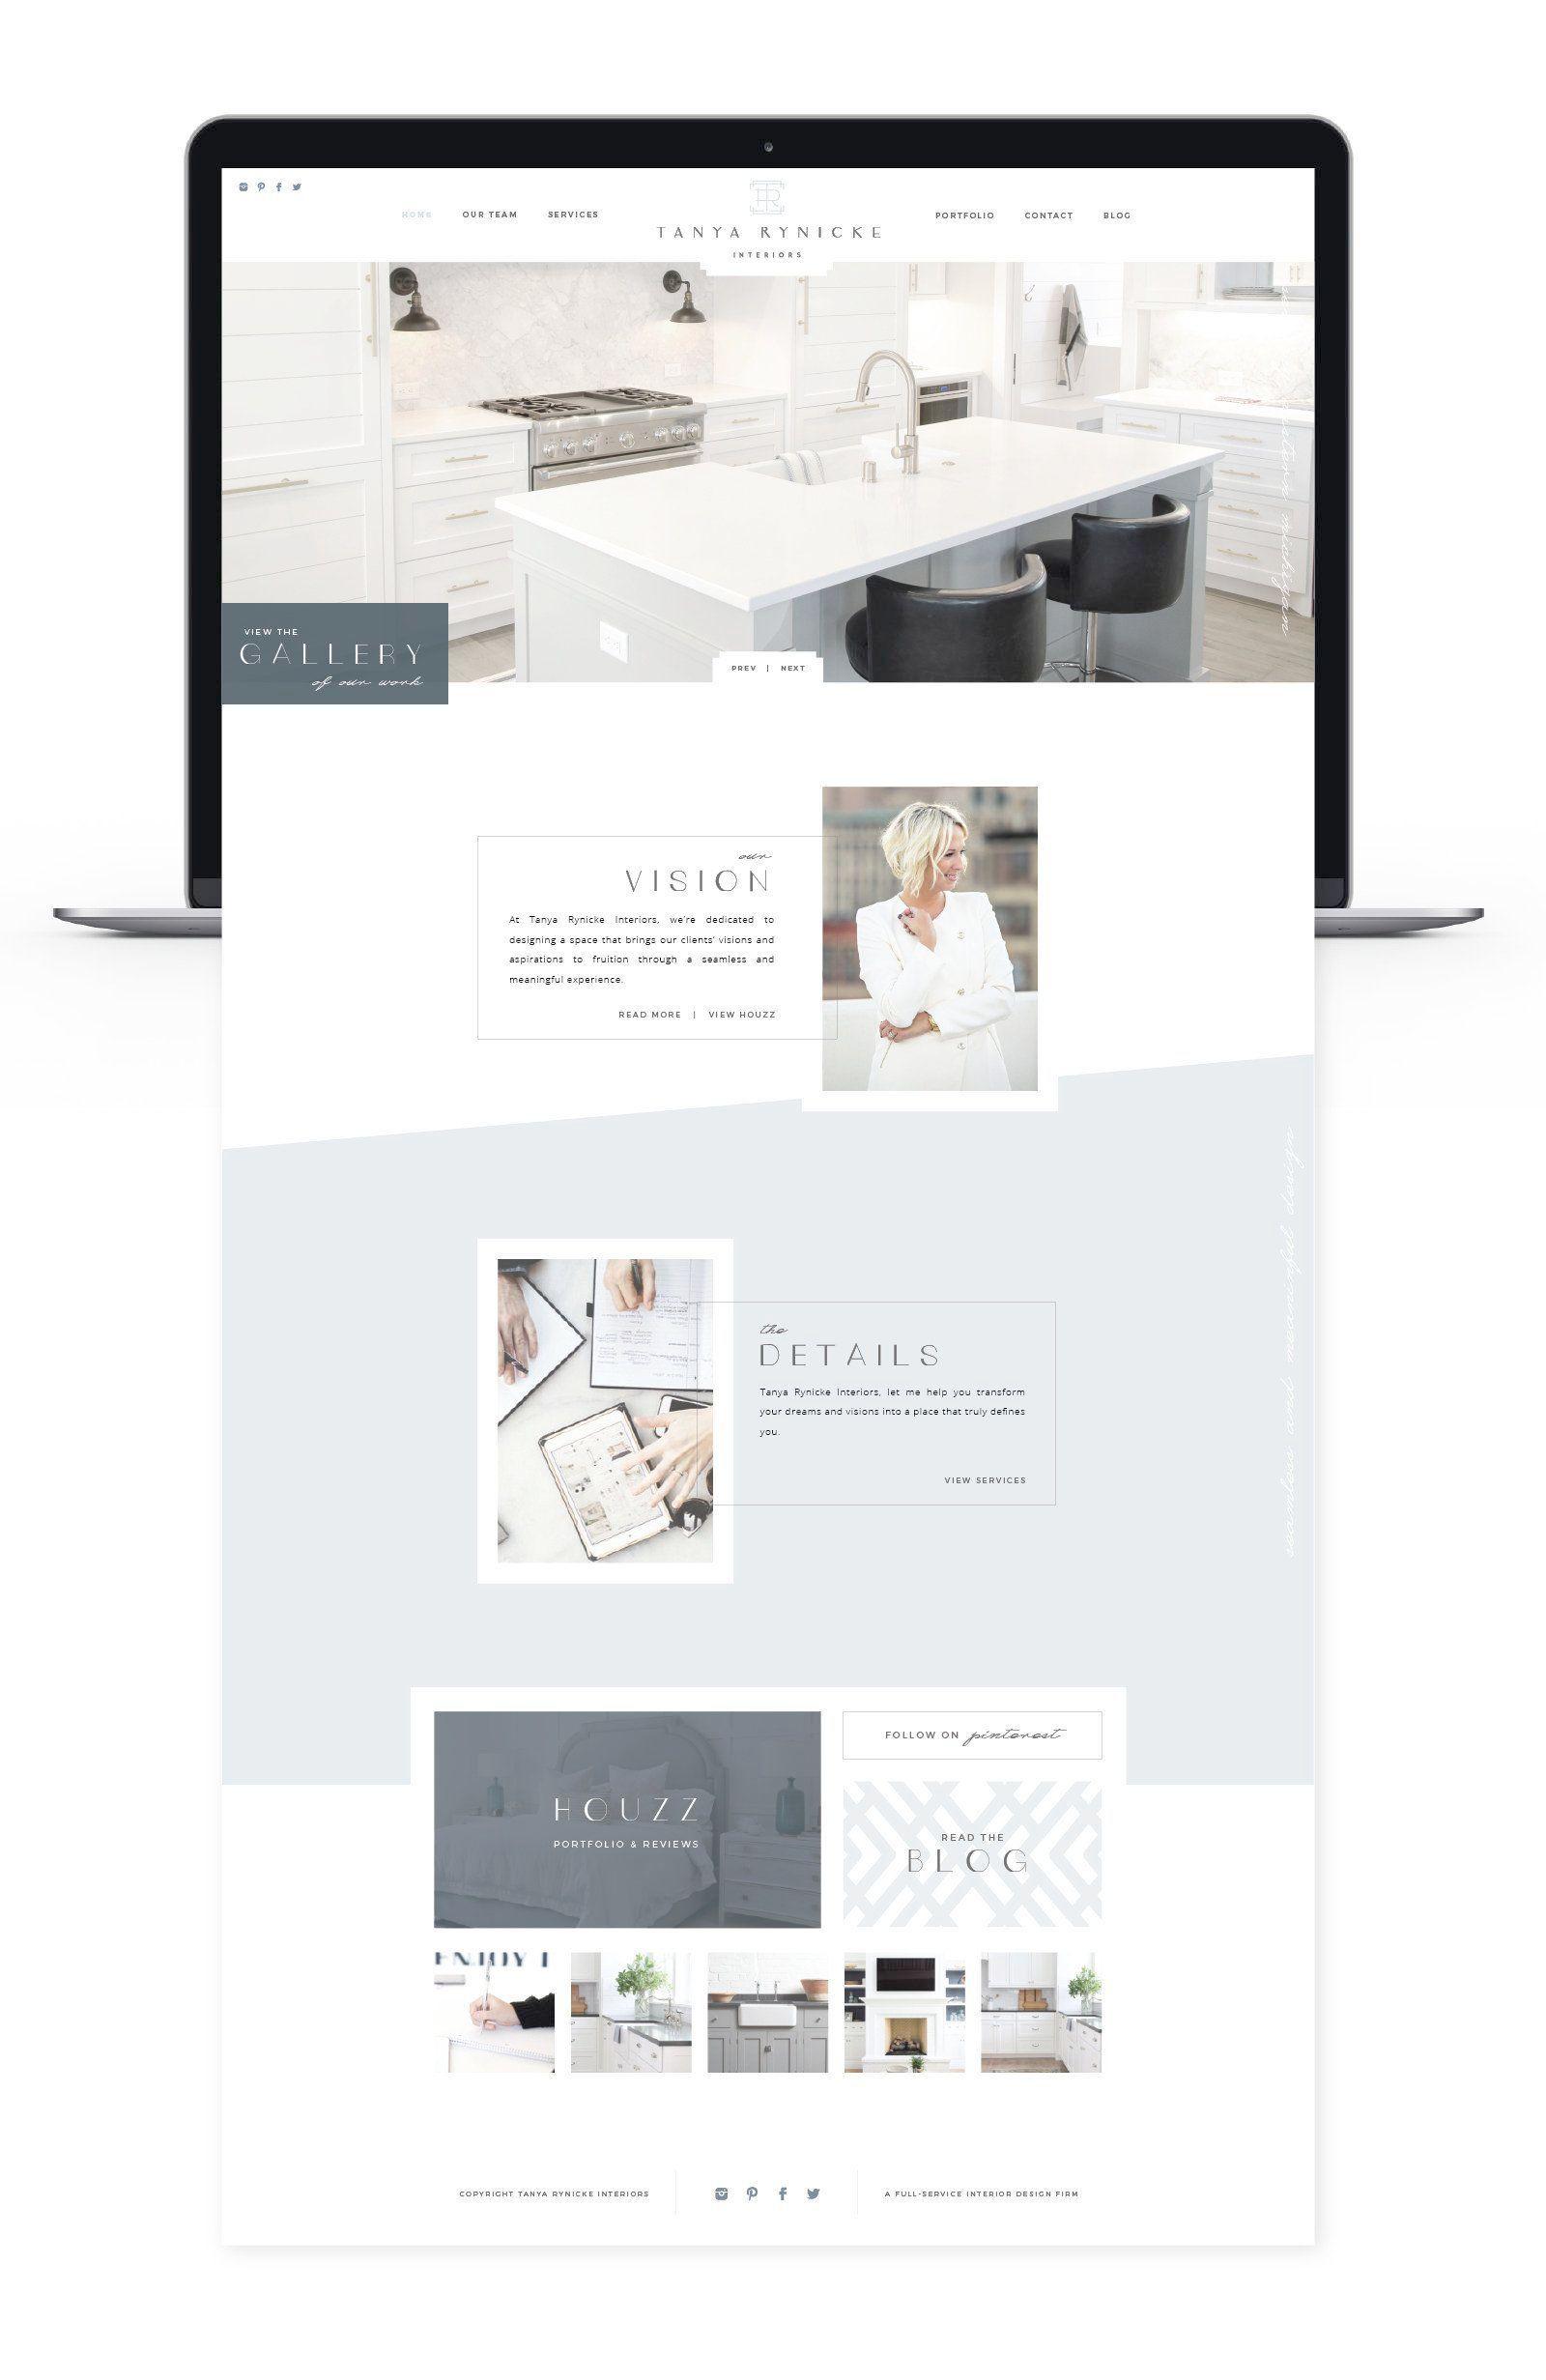 Writing For Medium After Writing Strategies Rock N Learn Its Writing Strategies Reading R Interior Design Website Web Design Tips Small Business Website Design